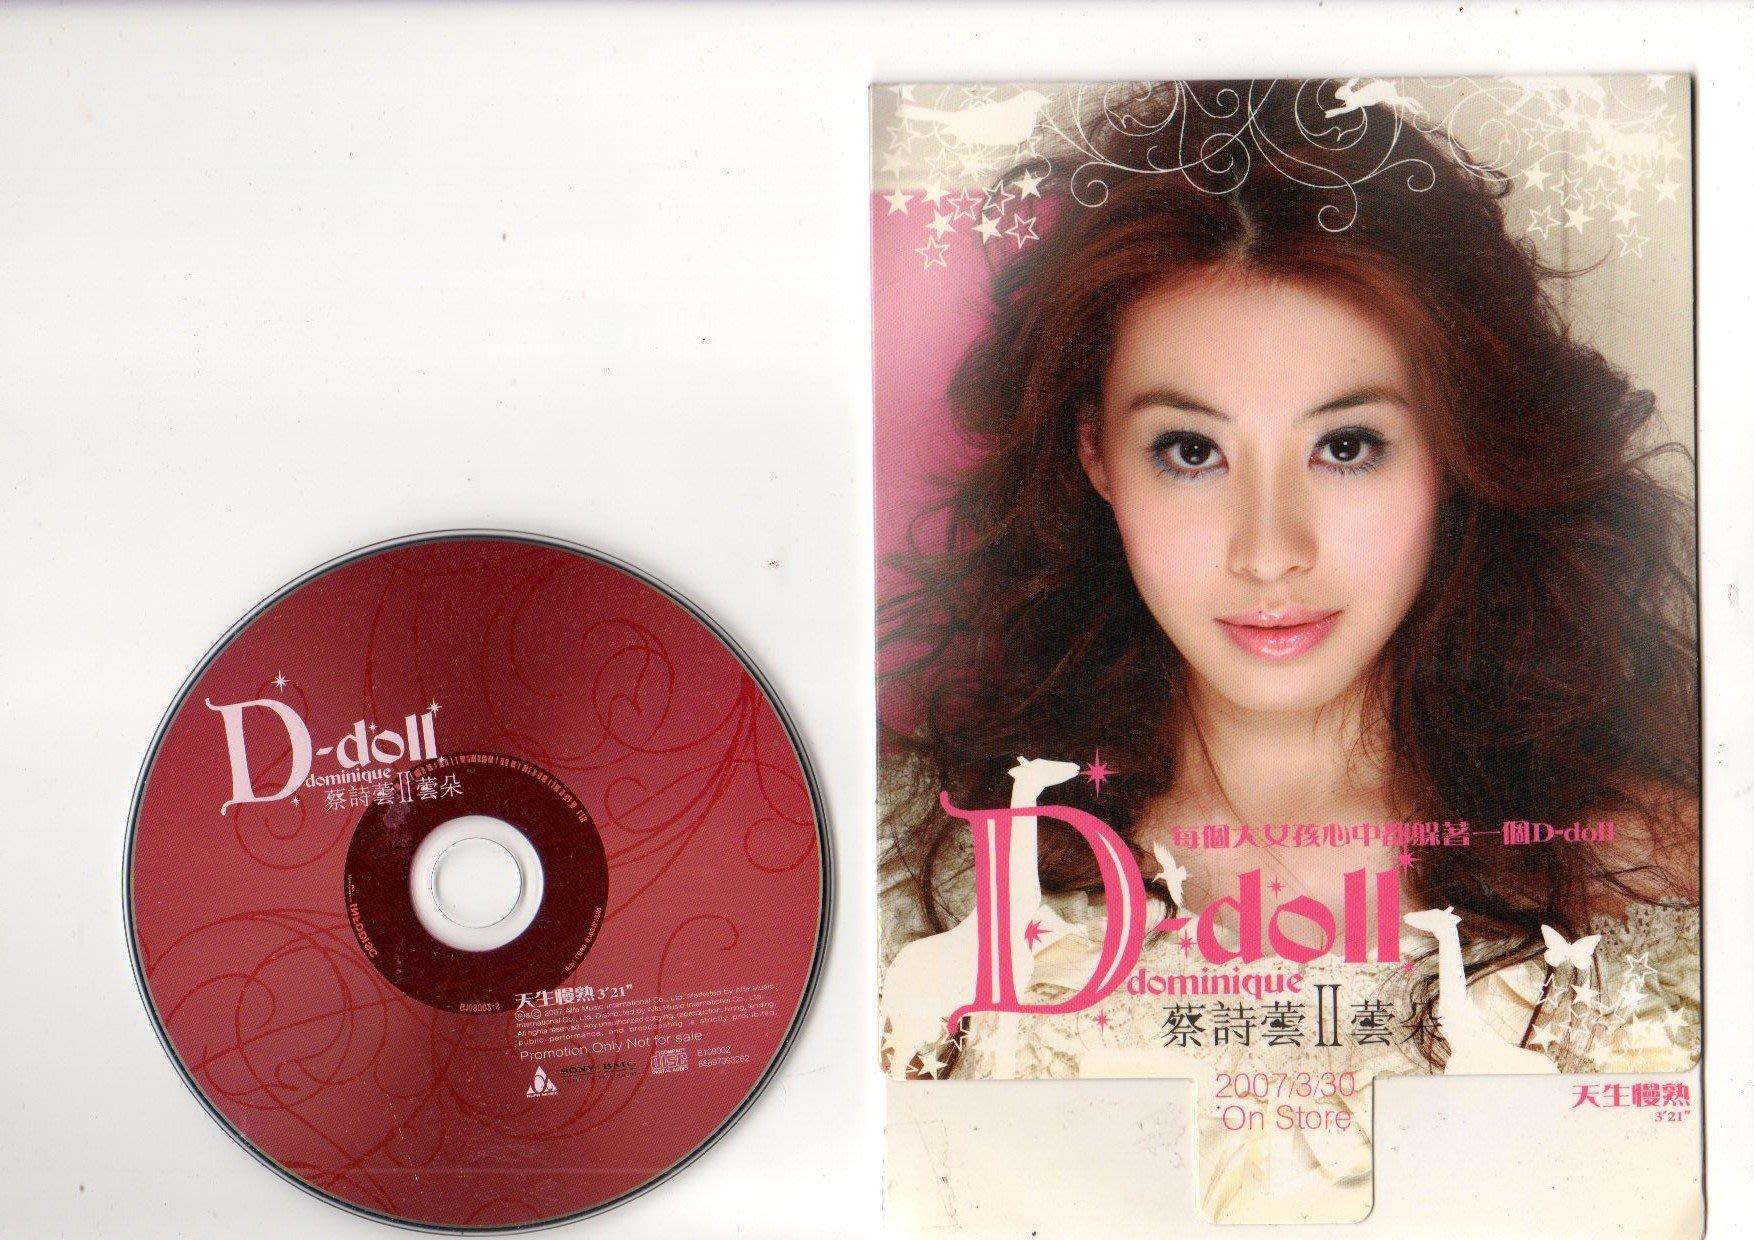 蔡詩蕓 II  蕓朵 D_doll 宣傳單曲 (天生慢熟)  CD  2007